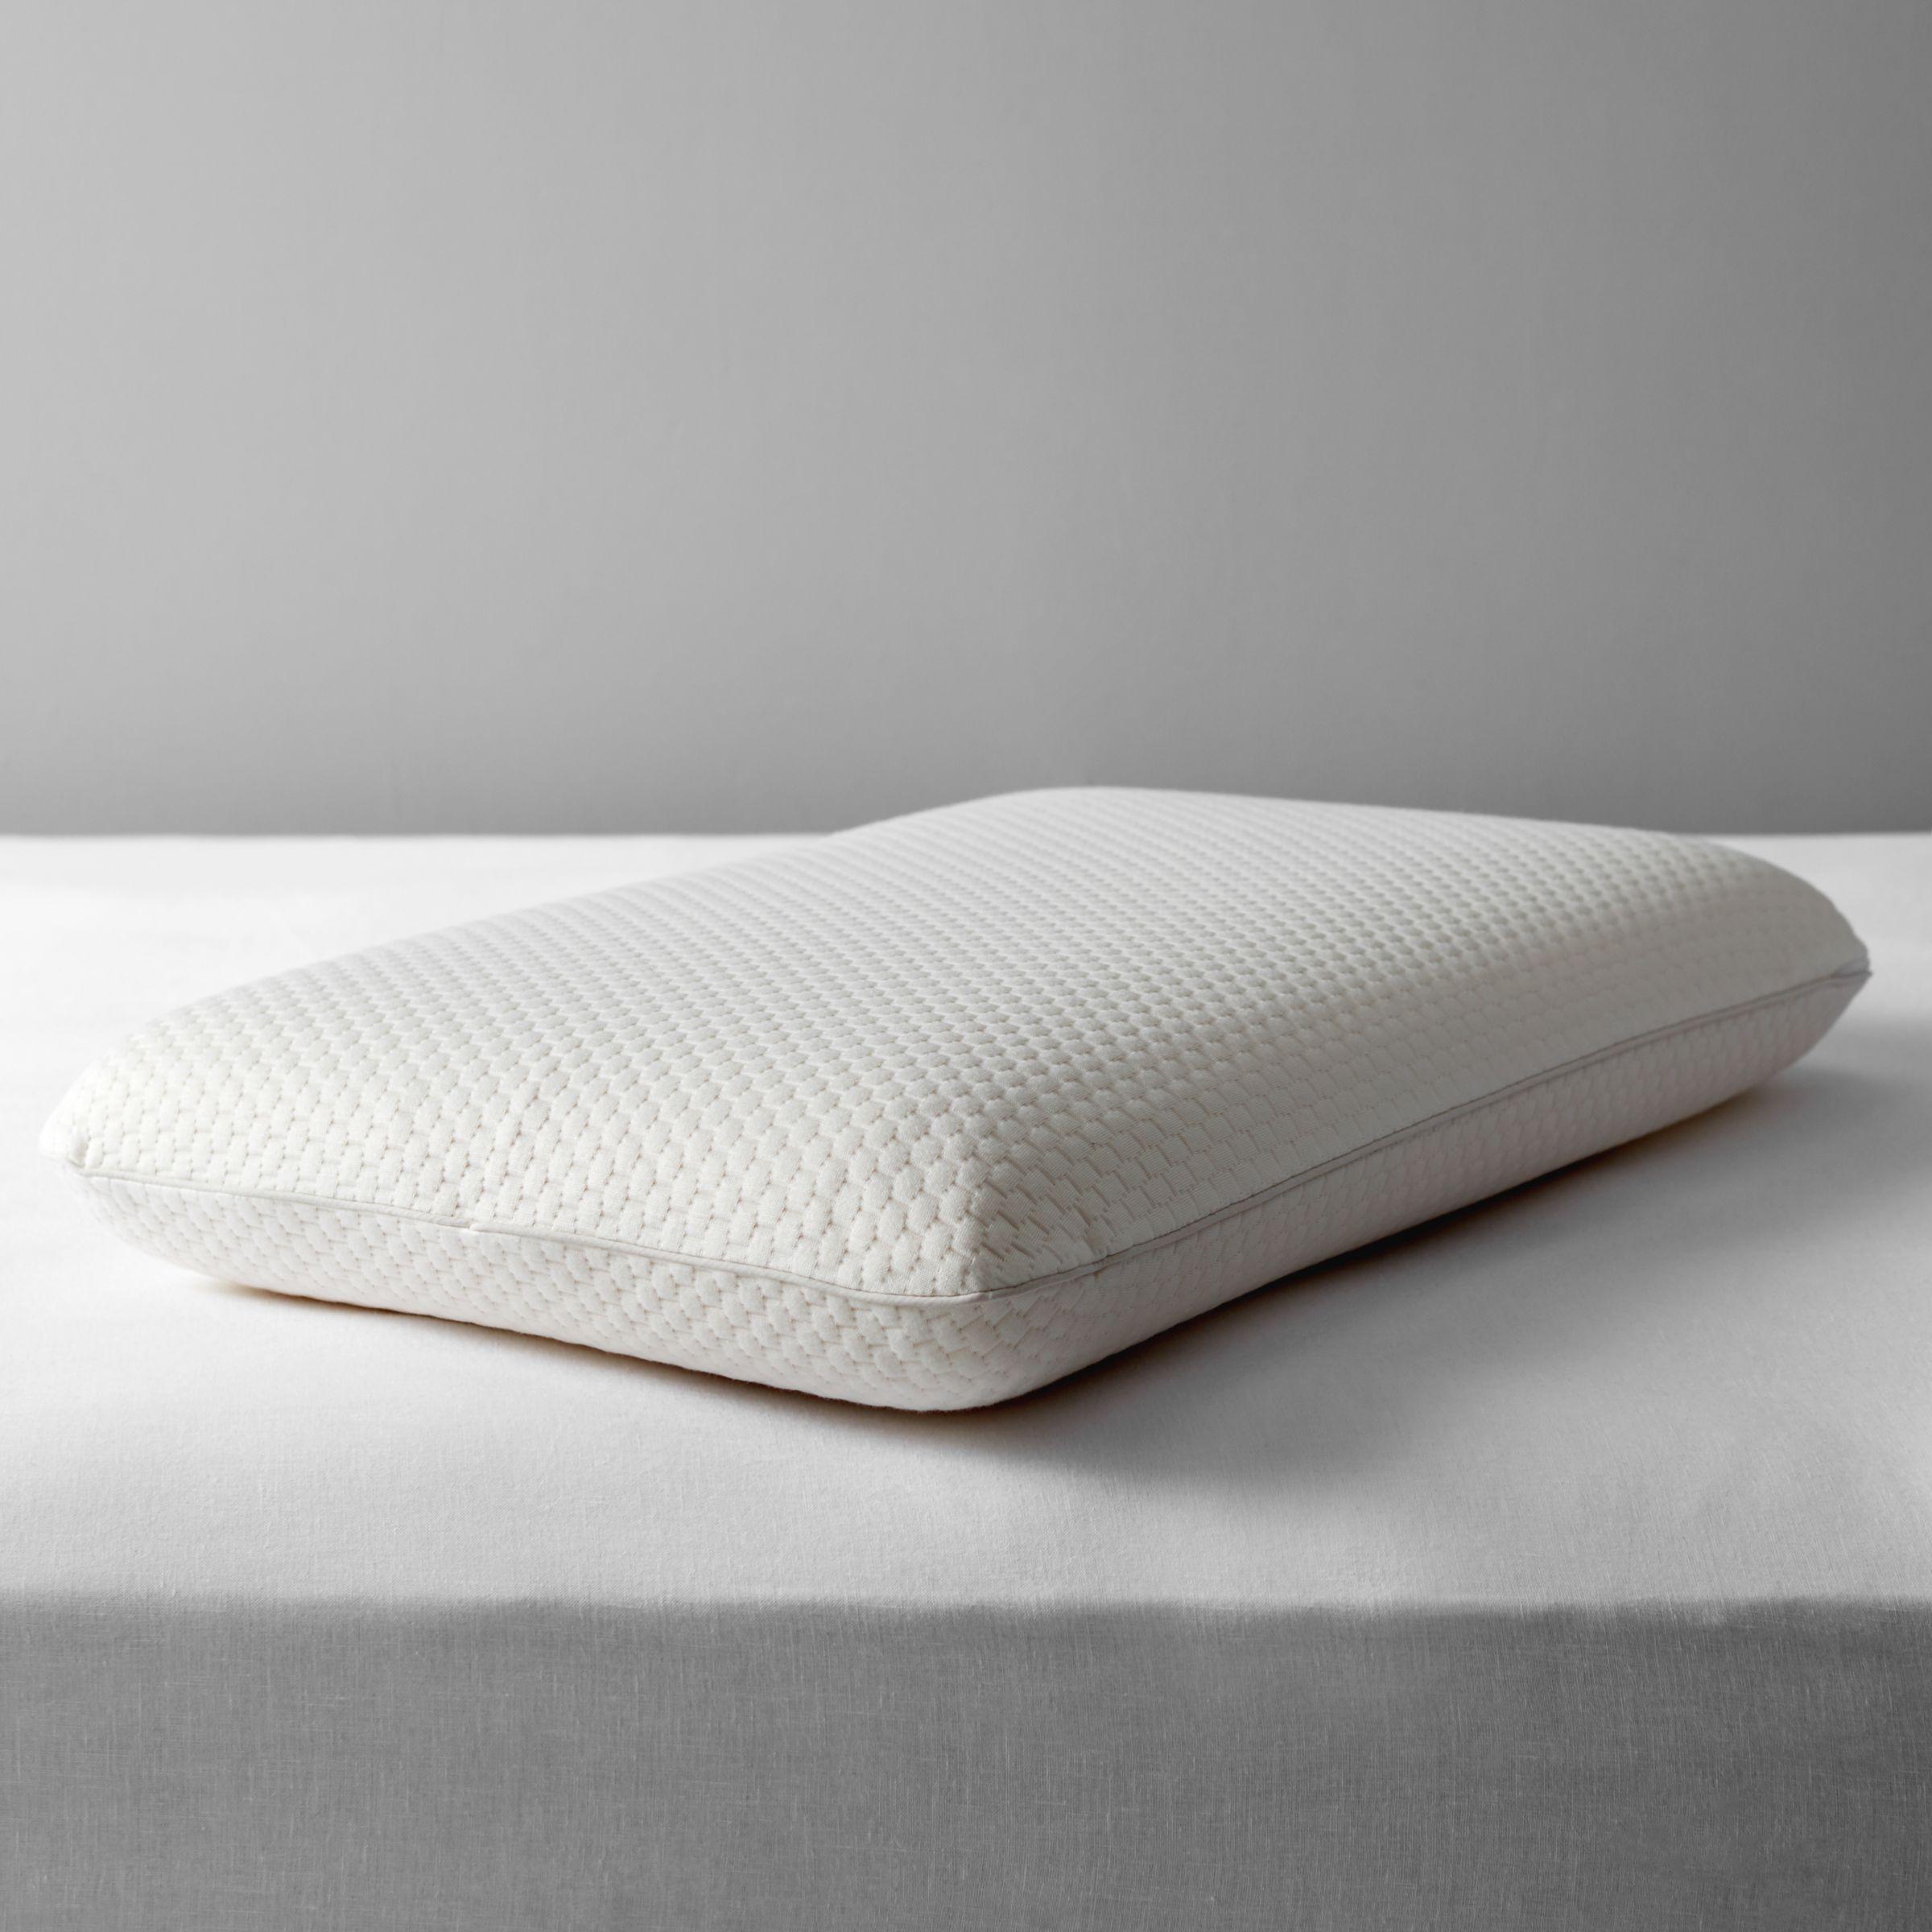 John Lewis & Partners Specialist Synthetic Memory Foam Standard Support Pillow, Medium/Firm